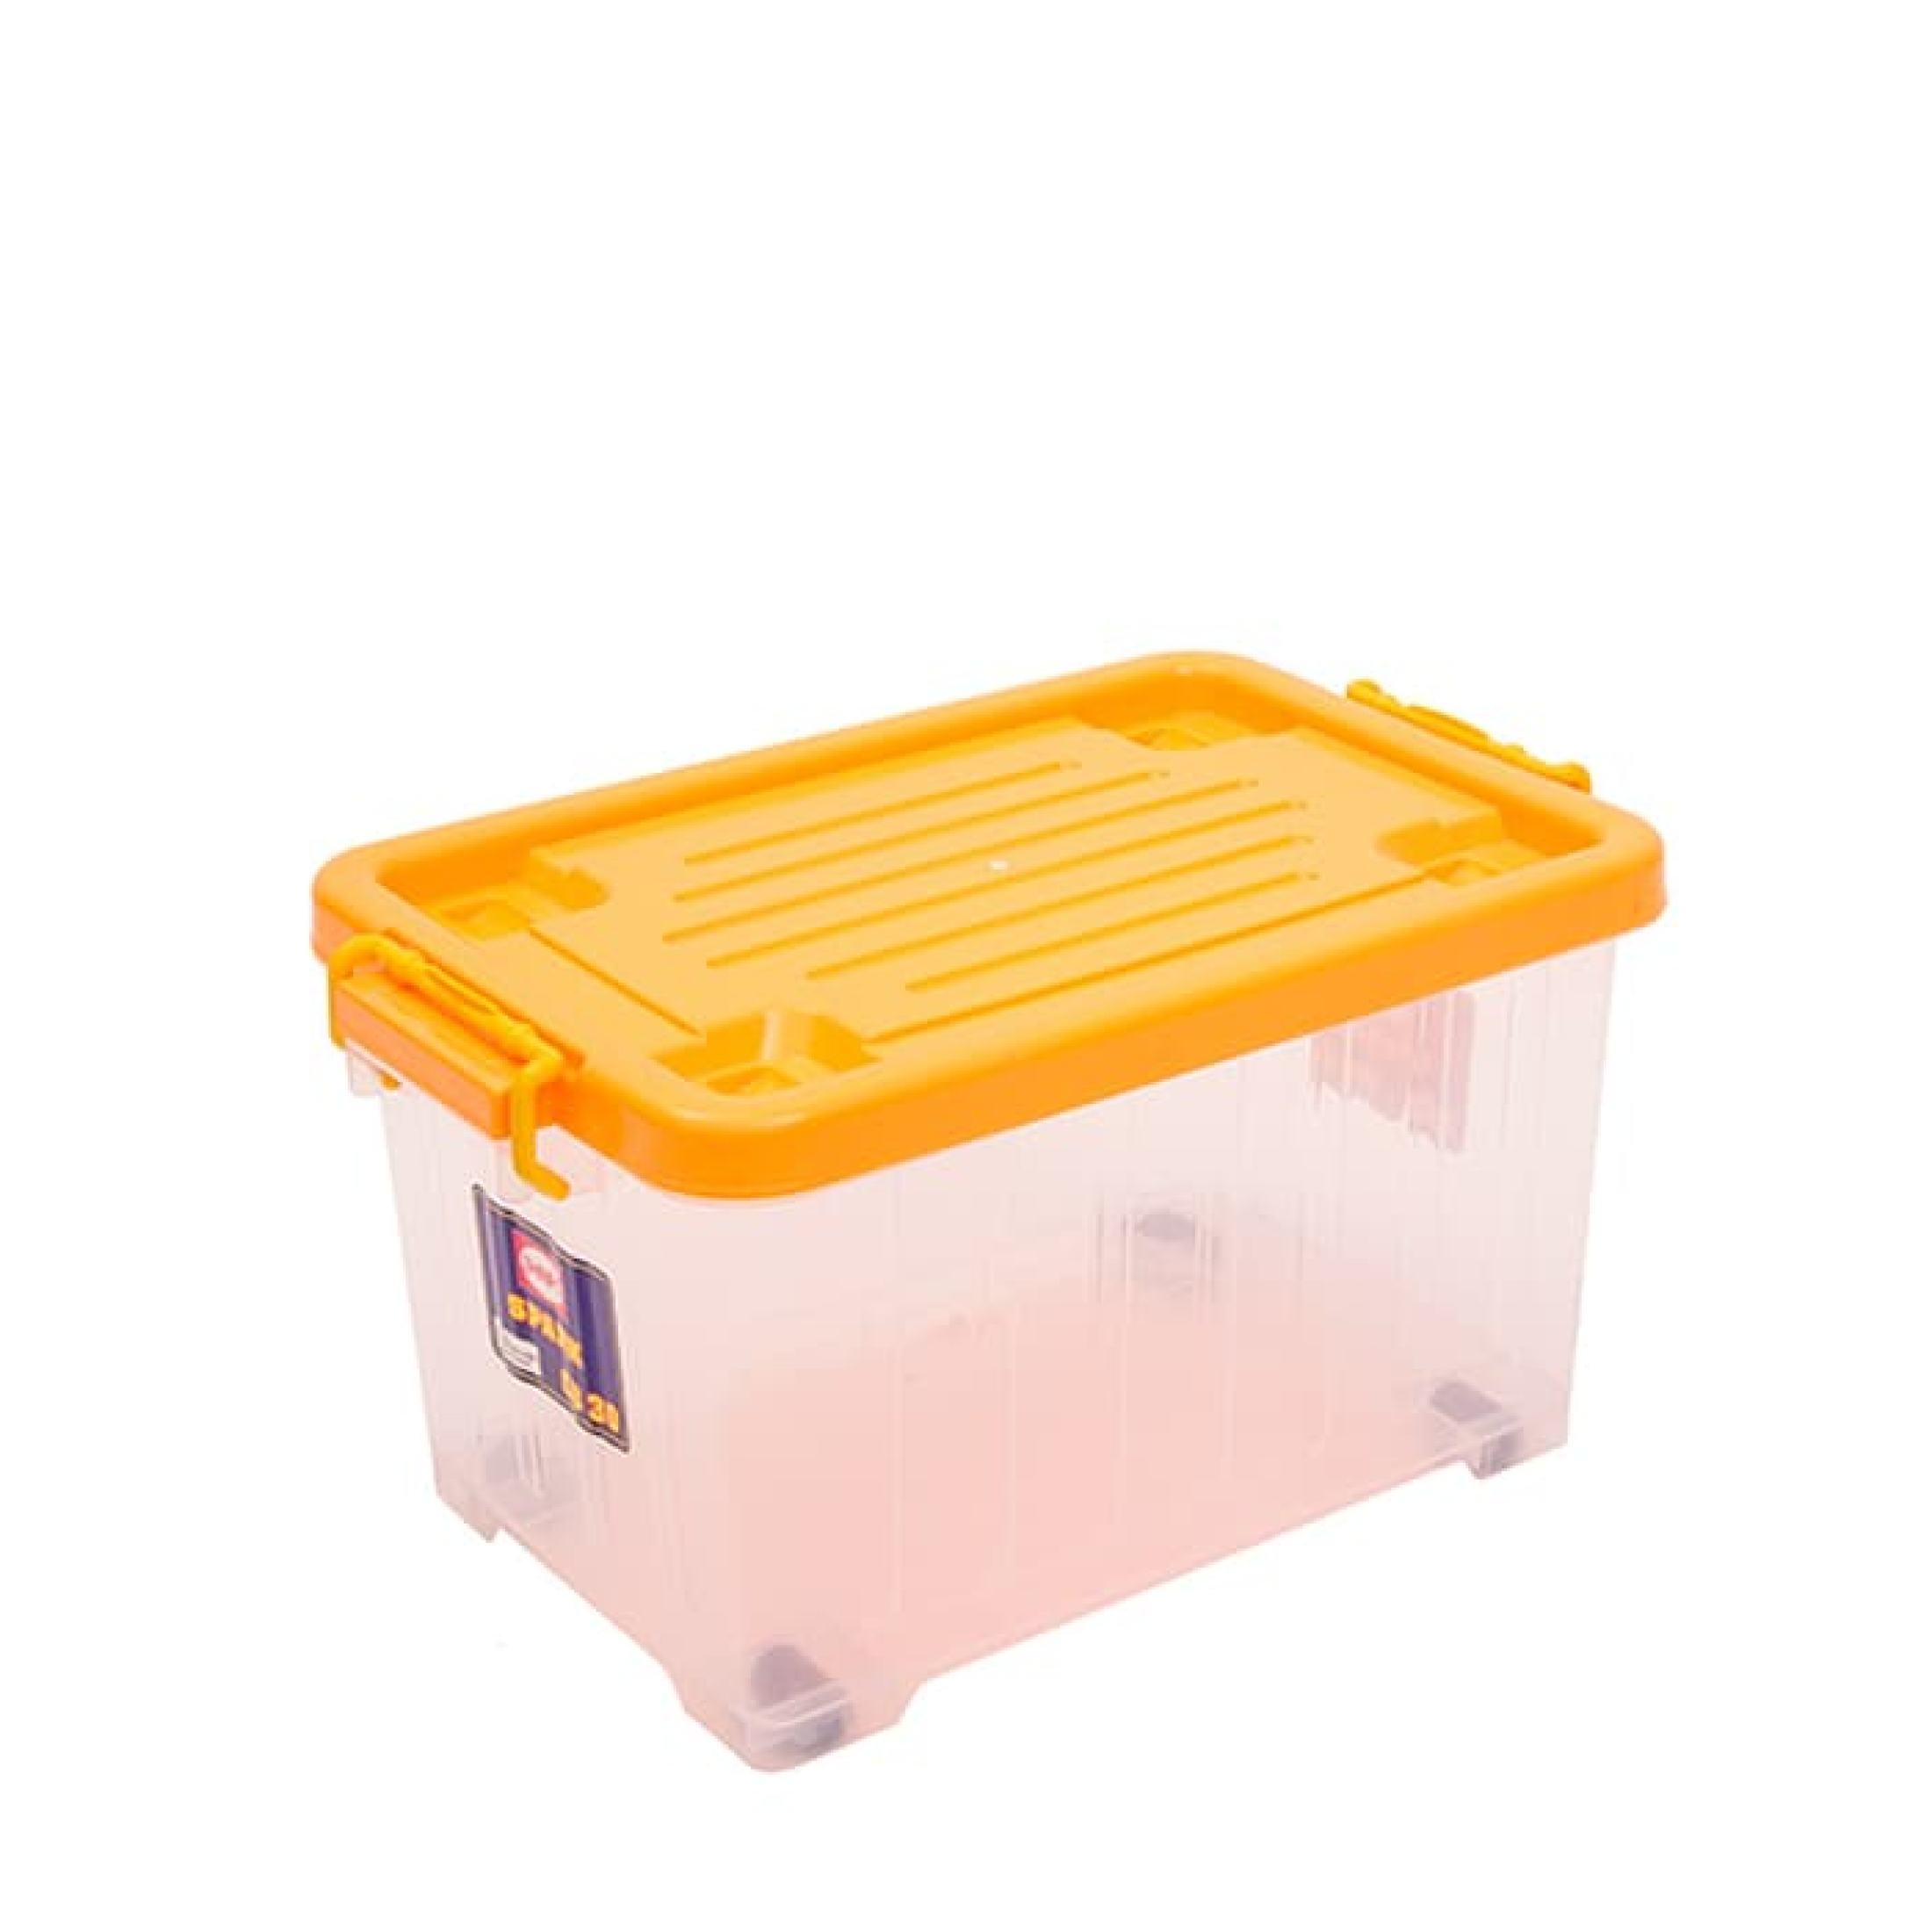 1oxsn6pdwvvrem Harga box container plastik